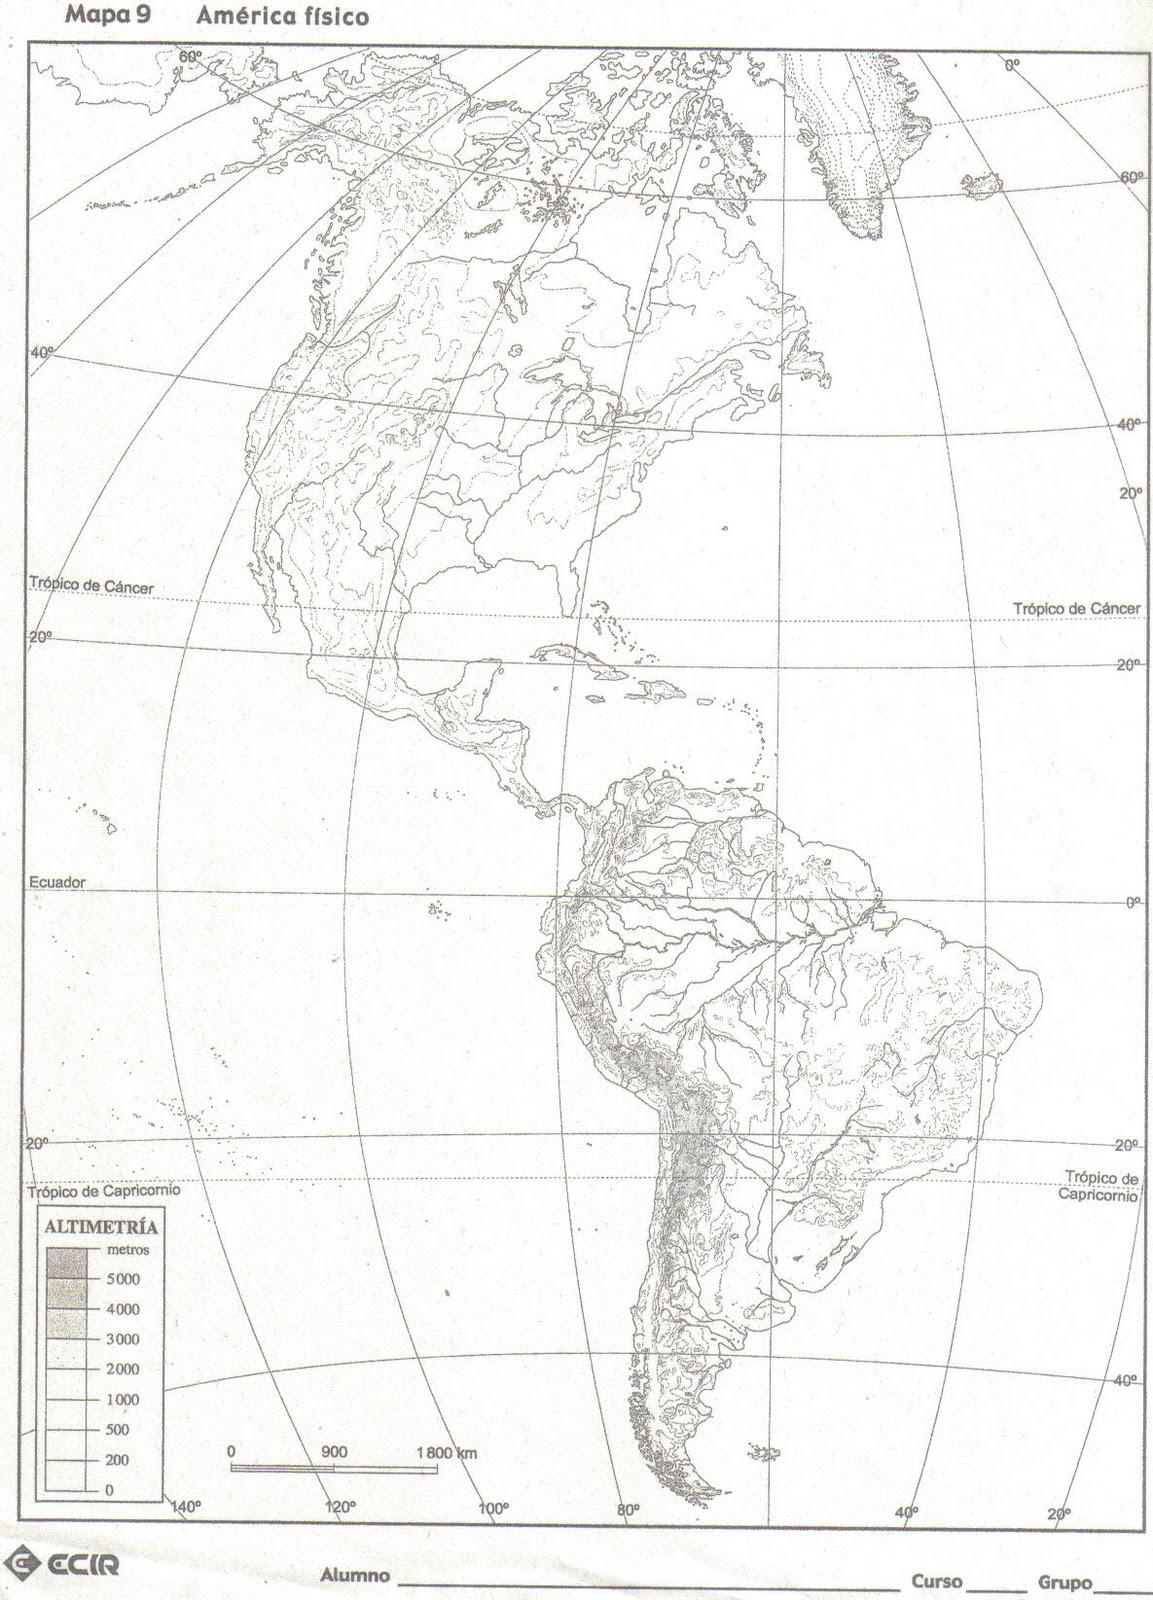 Mapa Fisico Mudo De Oceania Para Imprimir En A4